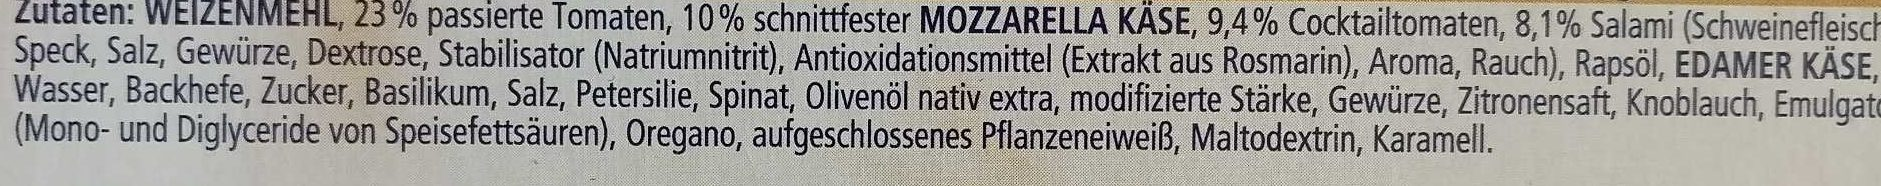 Ristorante Pizza Salame Mozzarella Pesto - Ingredients